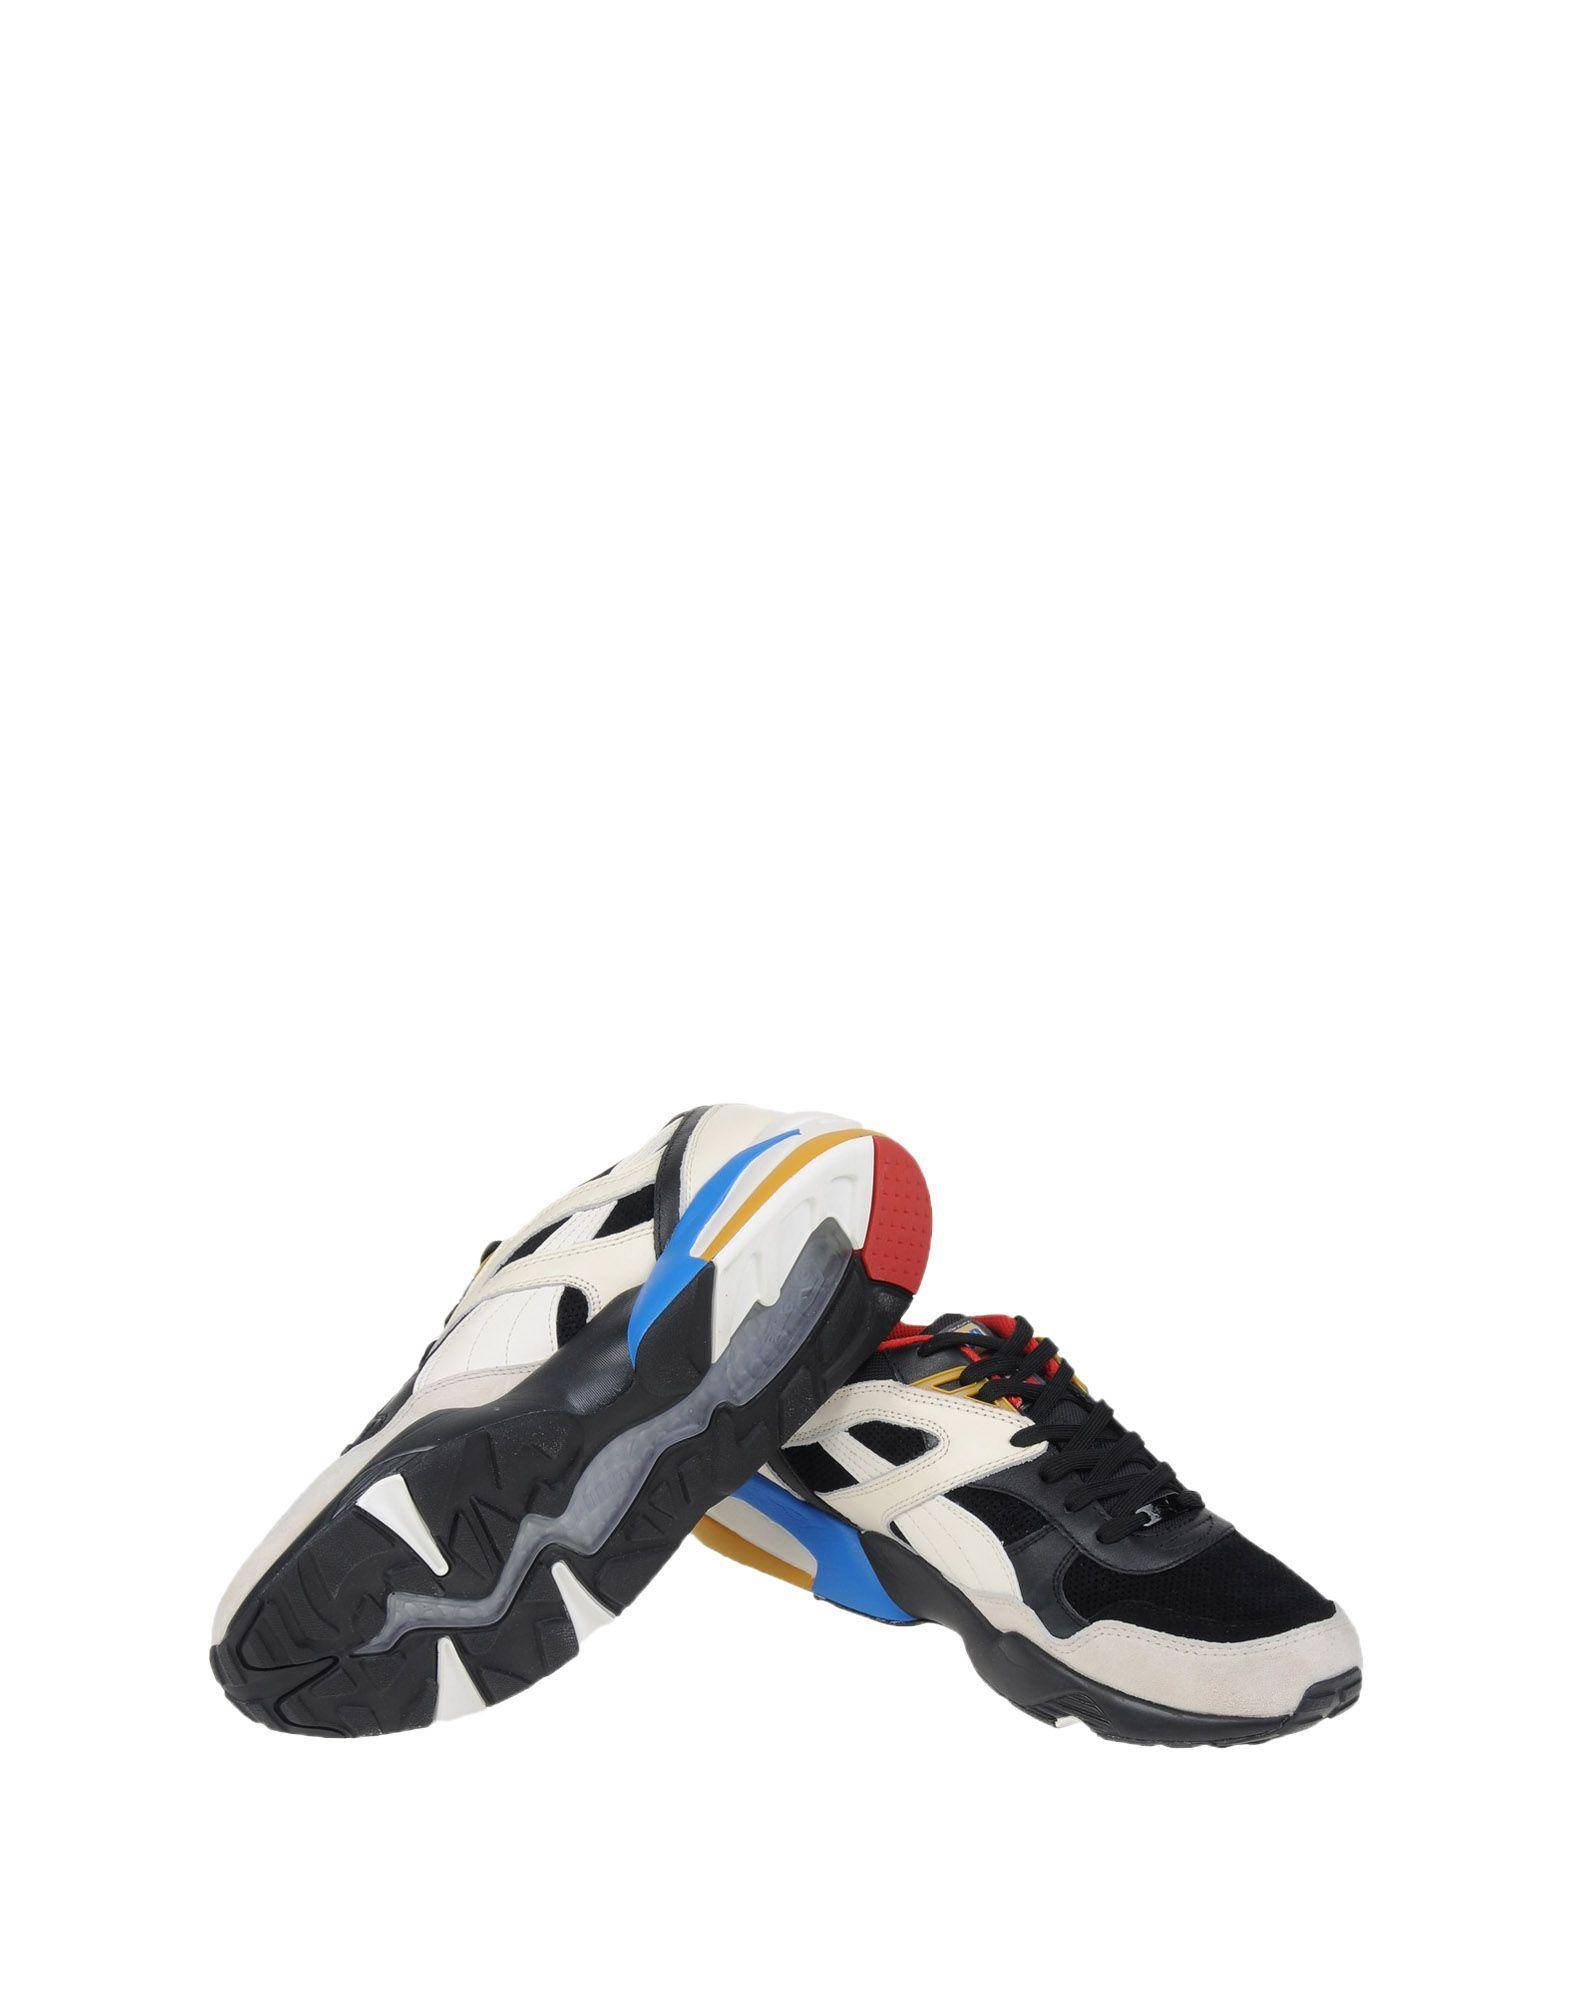 Sneakers Puma R698 Flag - Homme - Sneakers Puma sur